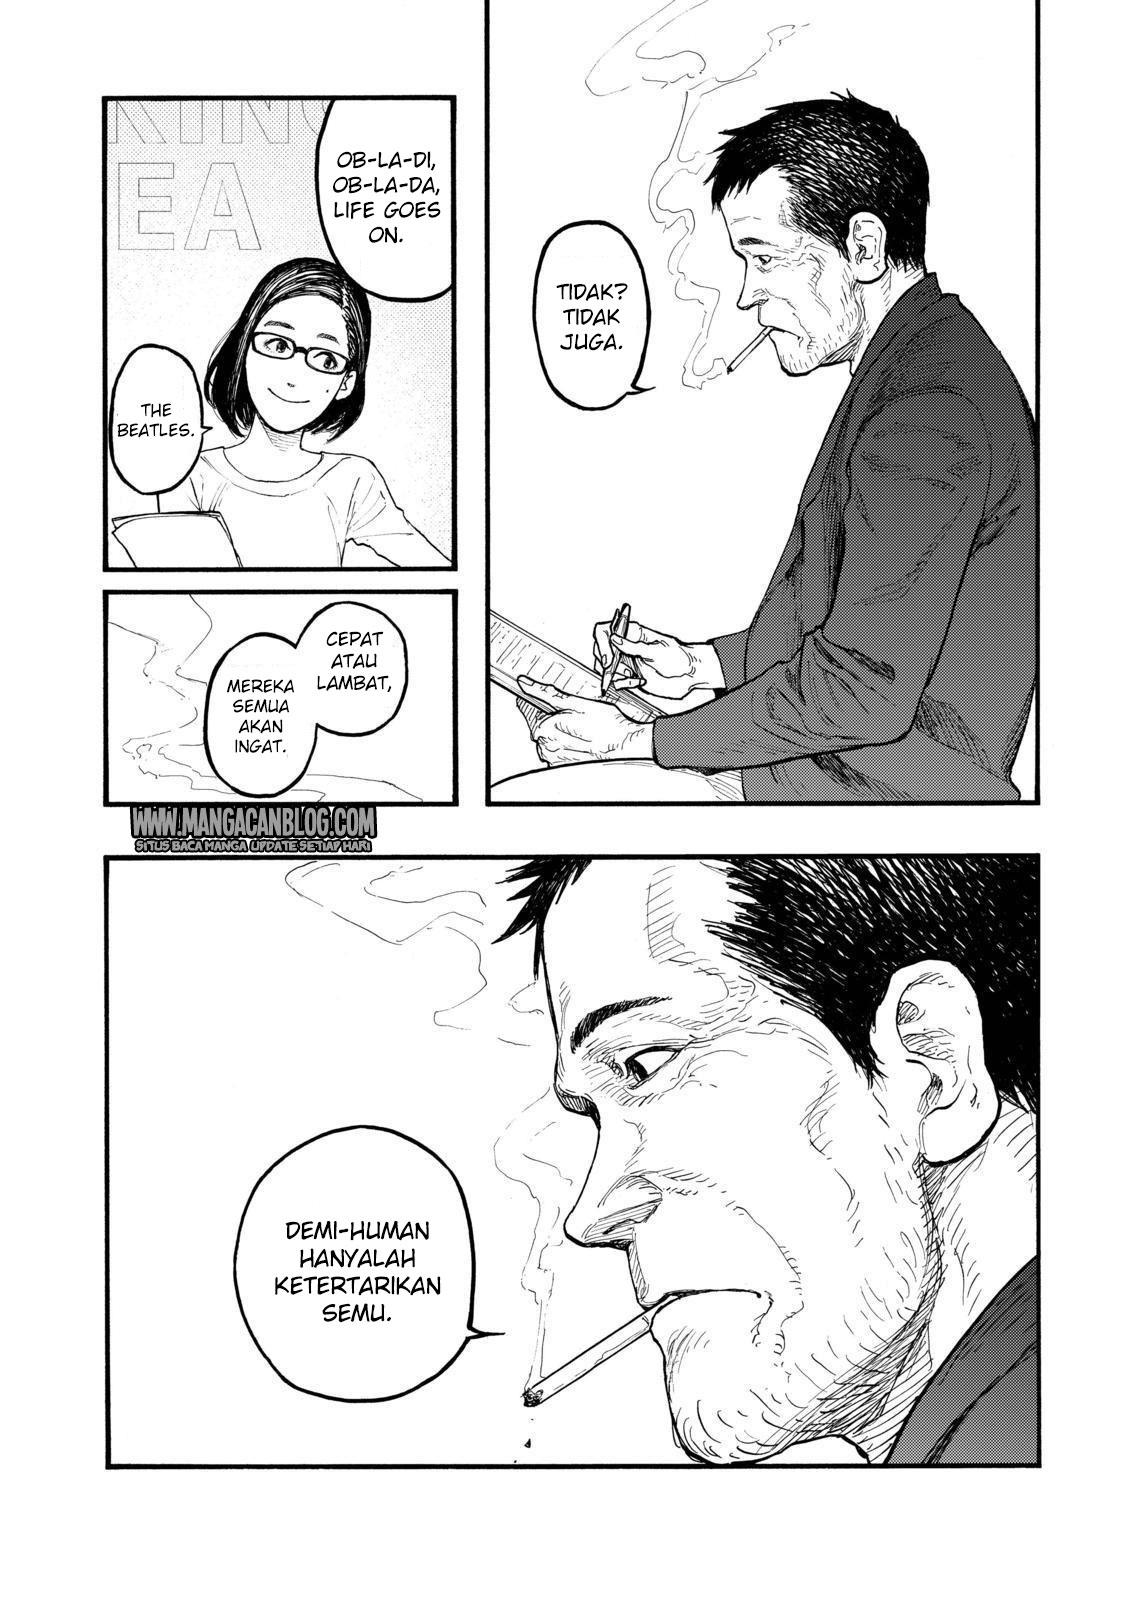 Dilarang COPAS - situs resmi www.mangacanblog.com - Komik ajin 046 - selamat pagi, sampai jumpa besok 47 Indonesia ajin 046 - selamat pagi, sampai jumpa besok Terbaru 22|Baca Manga Komik Indonesia|Mangacan